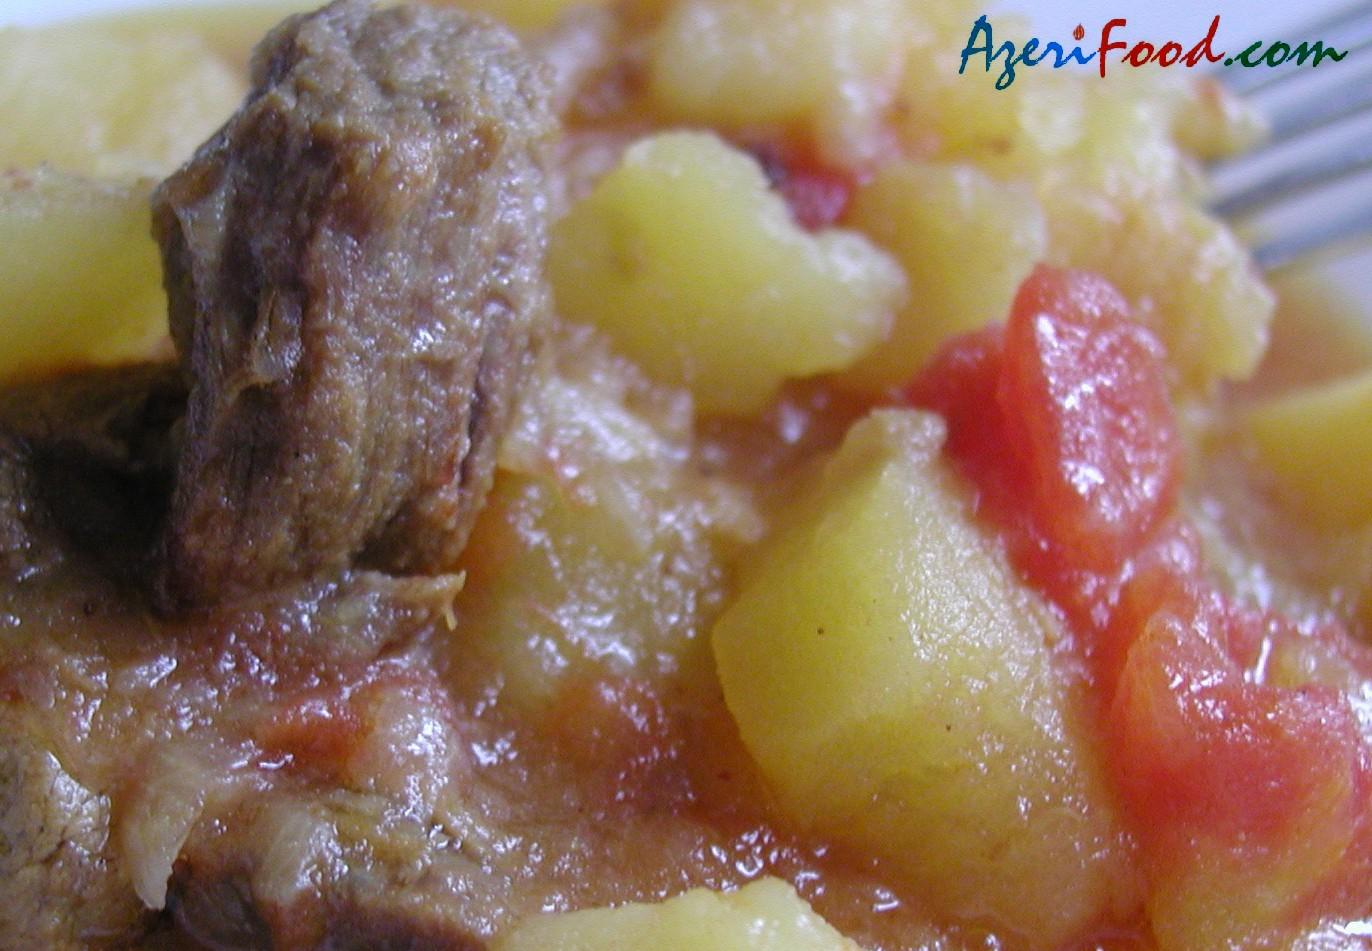 http://www.azerifood.com/images/3/sous11.jpg